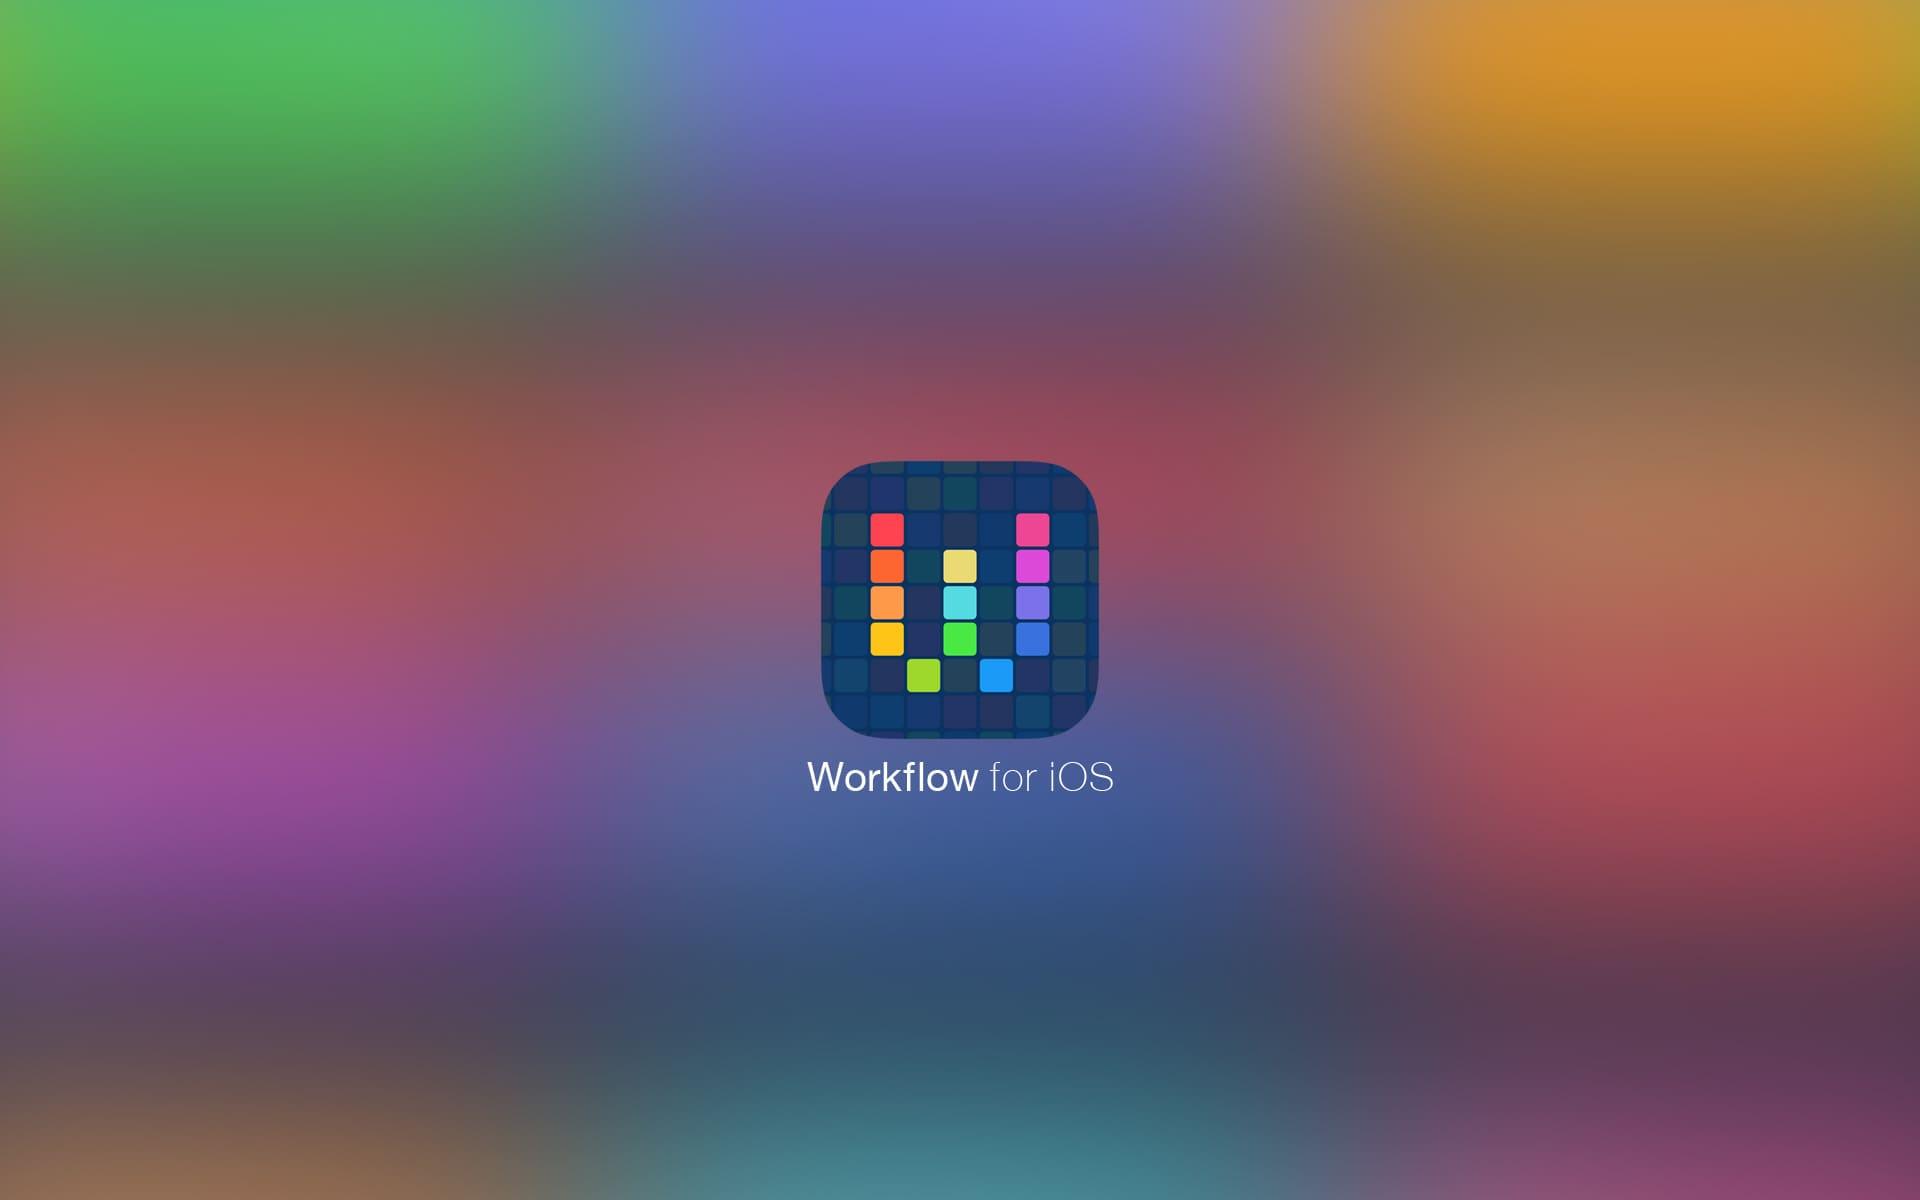 iOS『Workflow』の使い方とワークフロー(レシピ)のご紹介